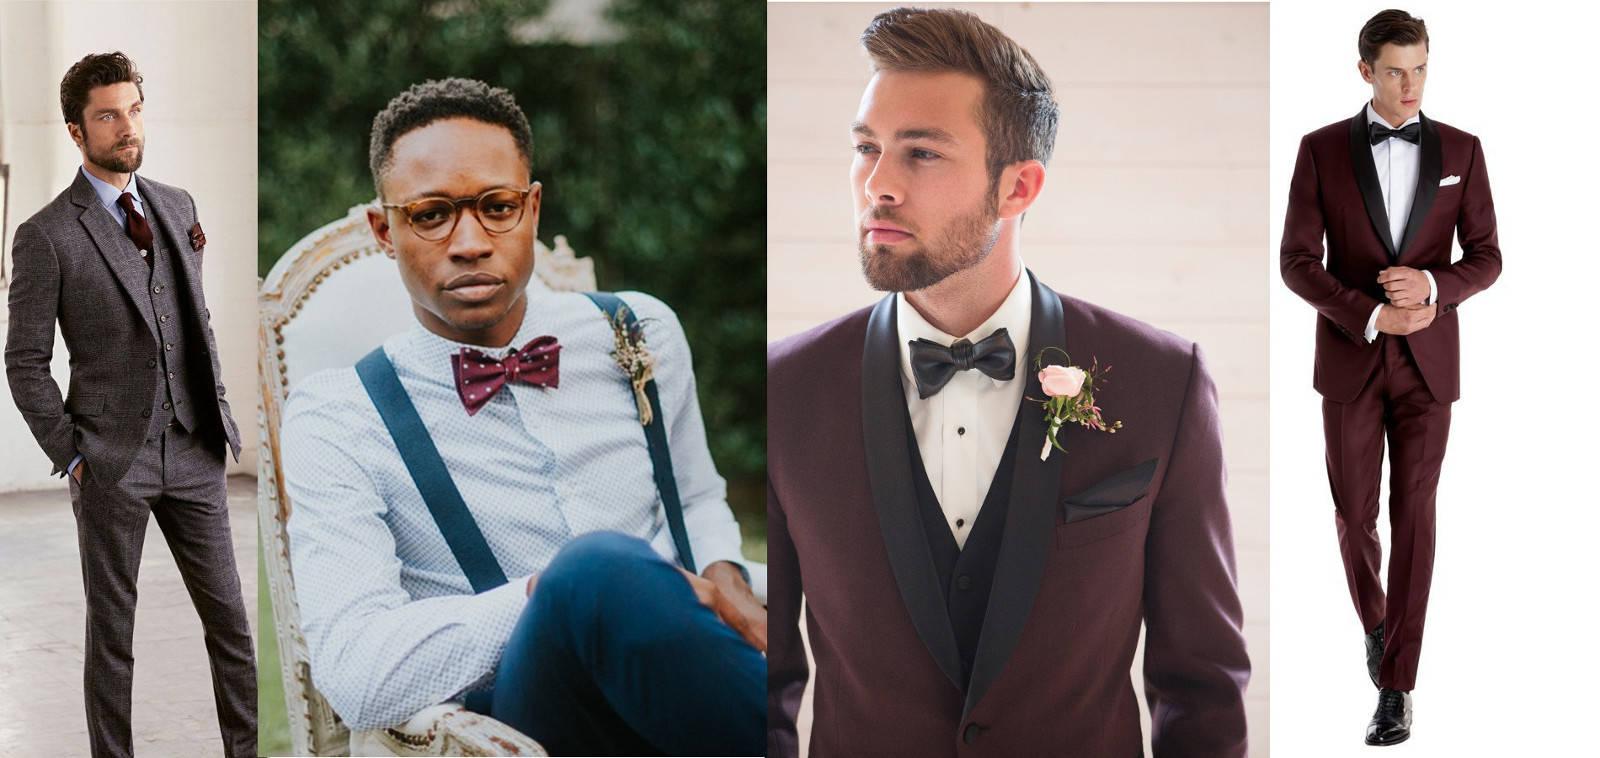 modne garnitury ślubny bordowe pan młody 2019